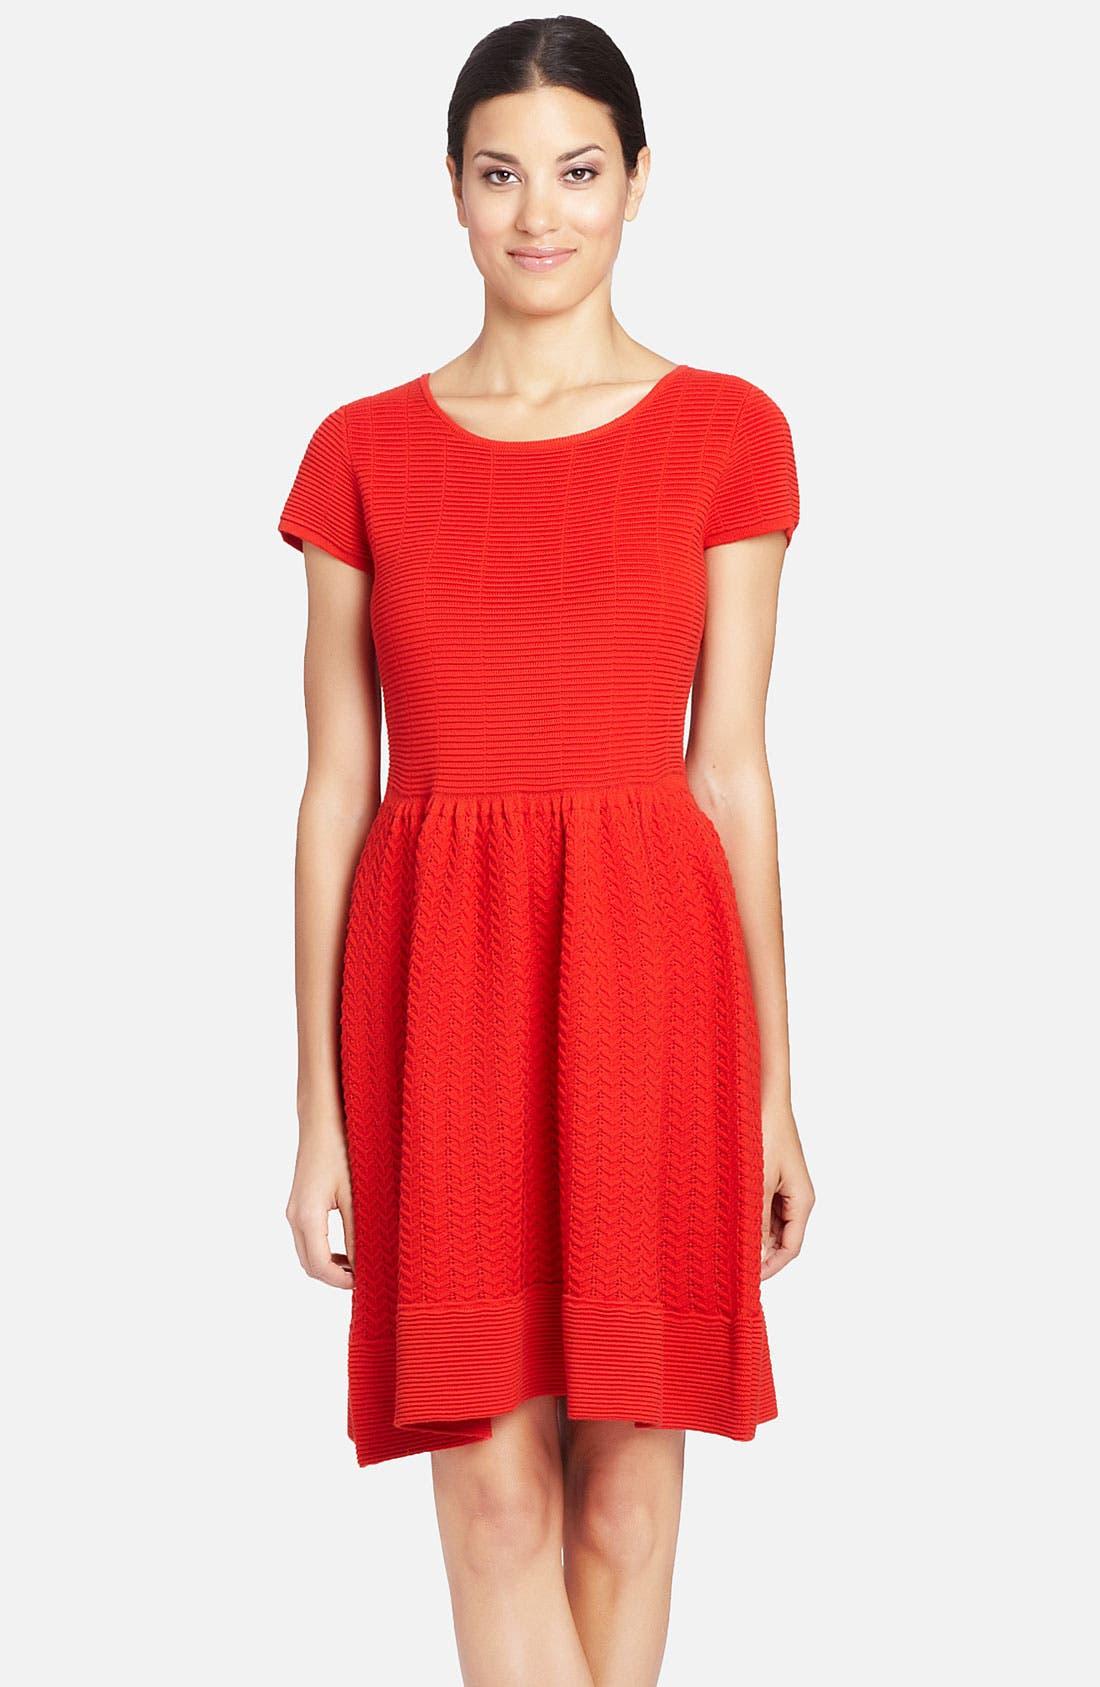 Alternate Image 1 Selected - Cynthia Steffe 'Marley' Knit Merino Wool Fit & Flare Dress